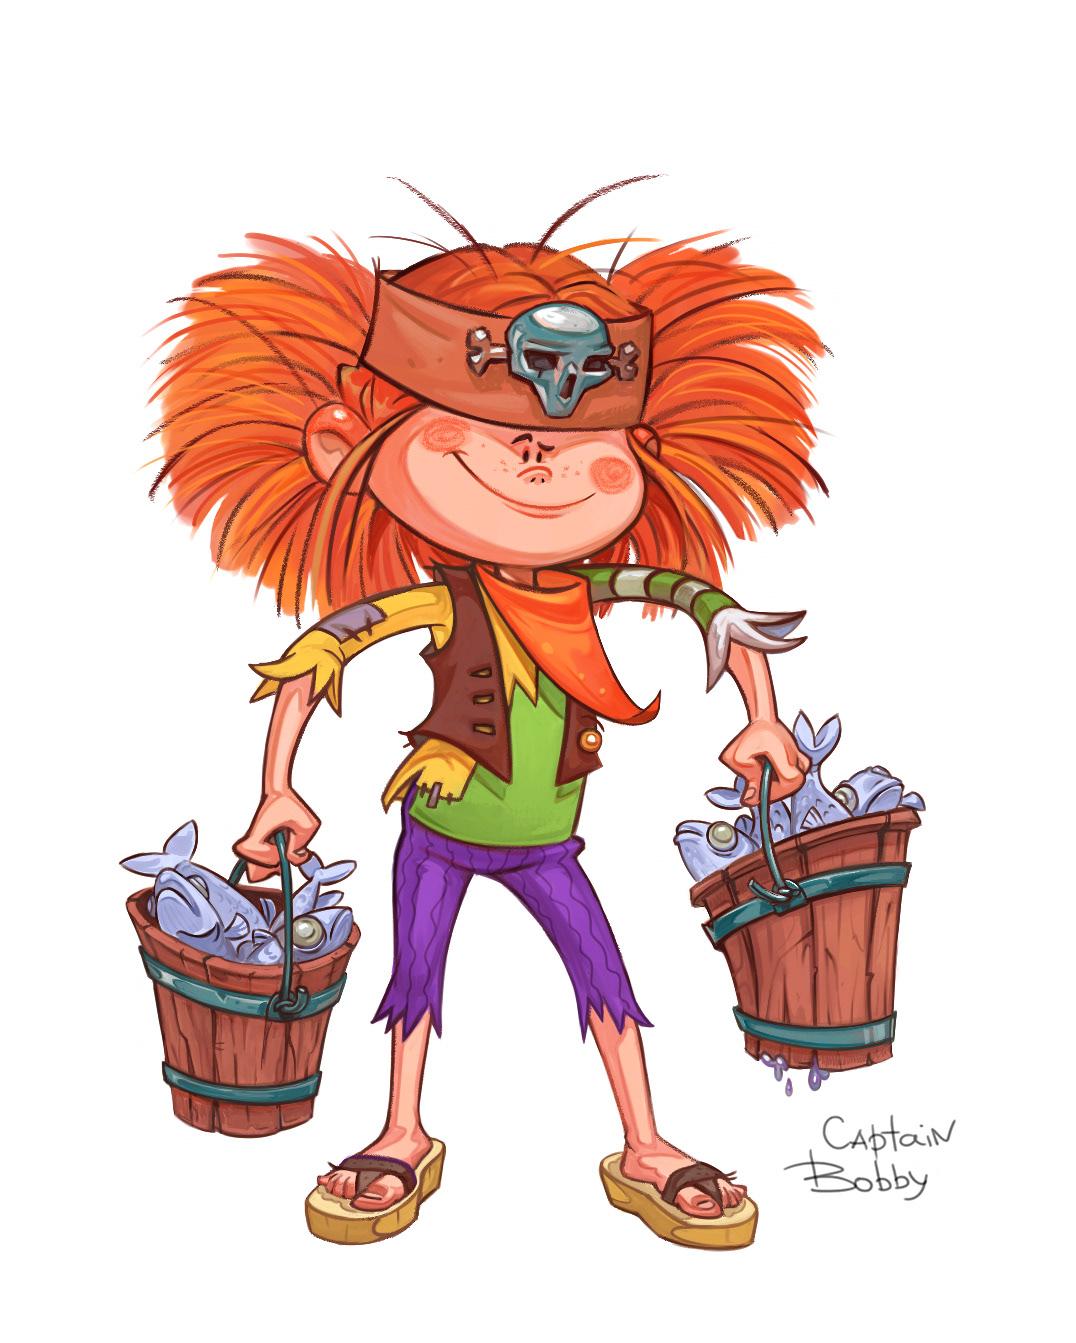 pirate boy characterdesign characterart digital 2D funny cartoon Children's Books ILLUSTRATION